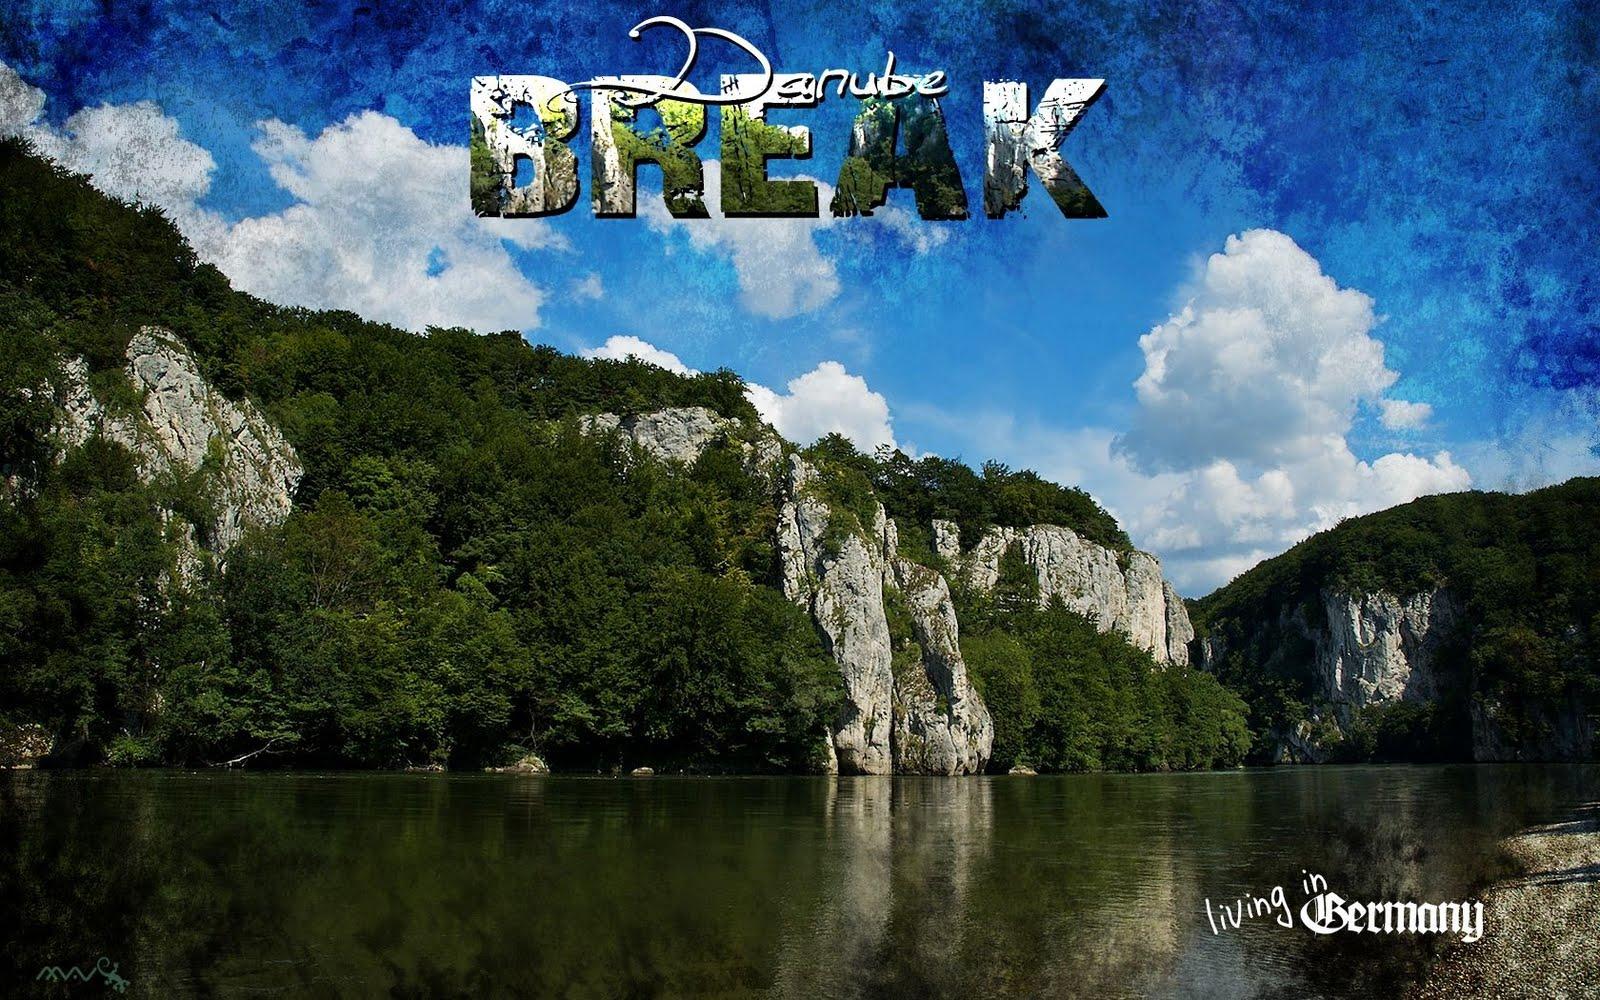 http://1.bp.blogspot.com/_Qel-Bl_AGS0/TOe6TbuuWaI/AAAAAAAAAck/XfaKfeSjqHg/s1600/Danube%2BBreak_2.JPG